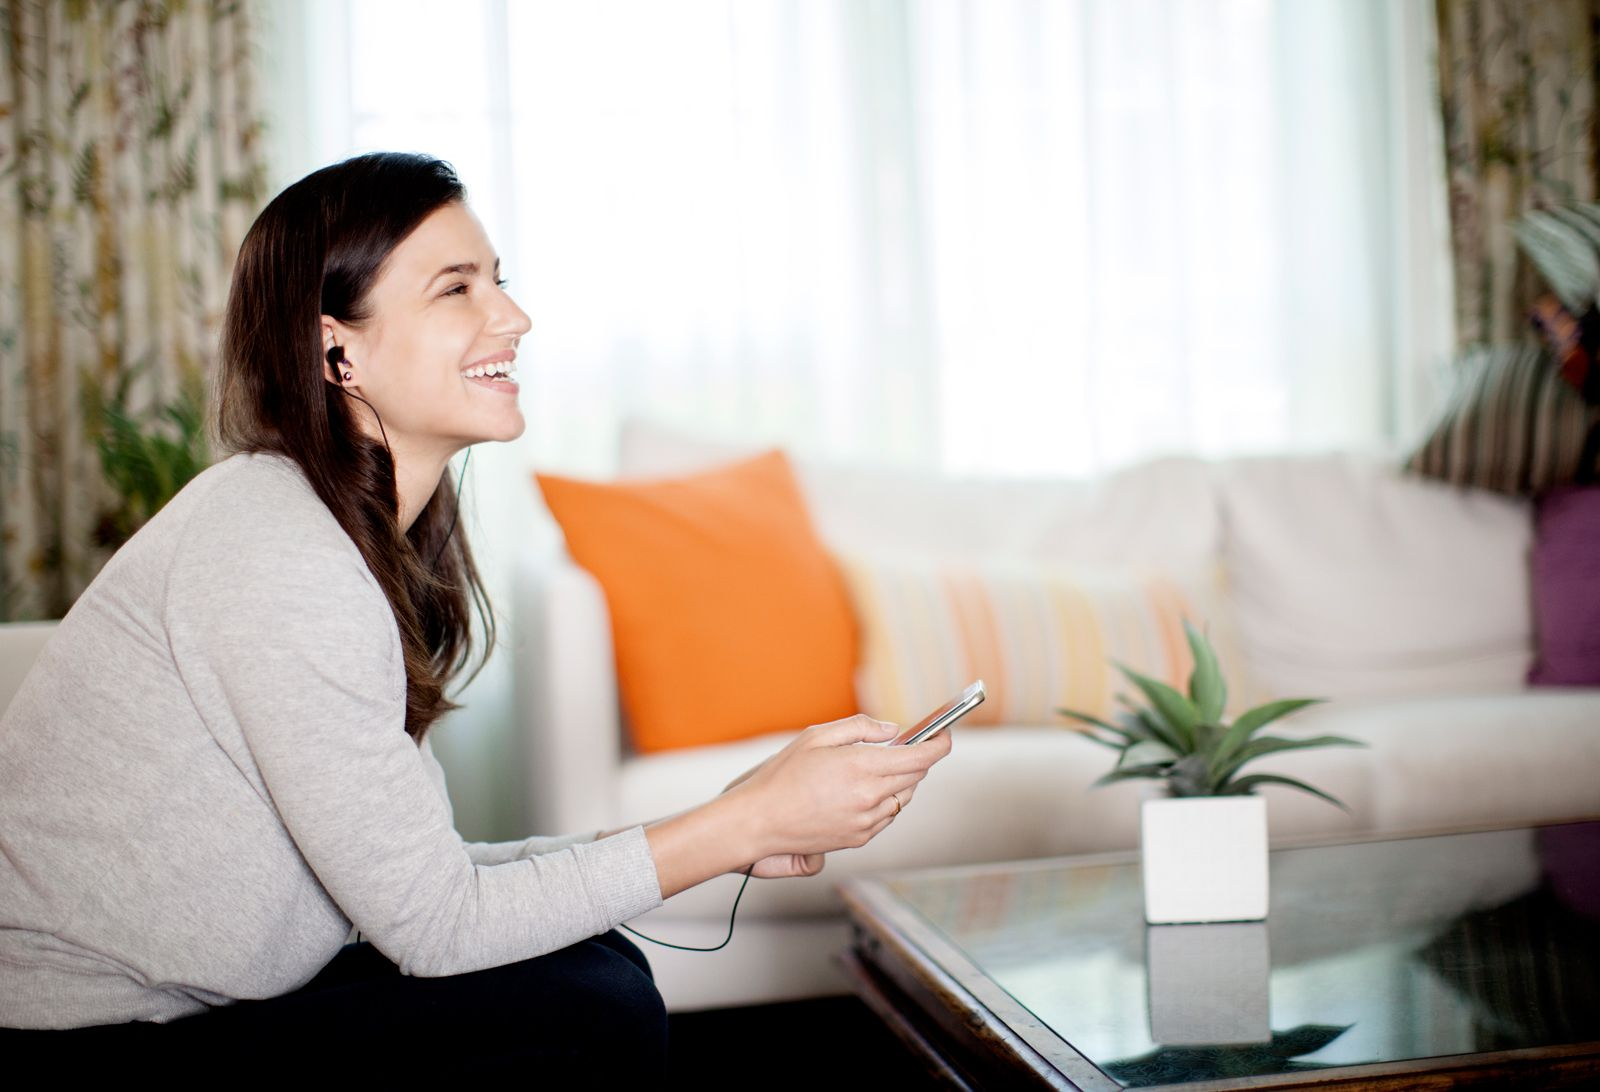 Latest roku tv update makes any smartphone a wireless